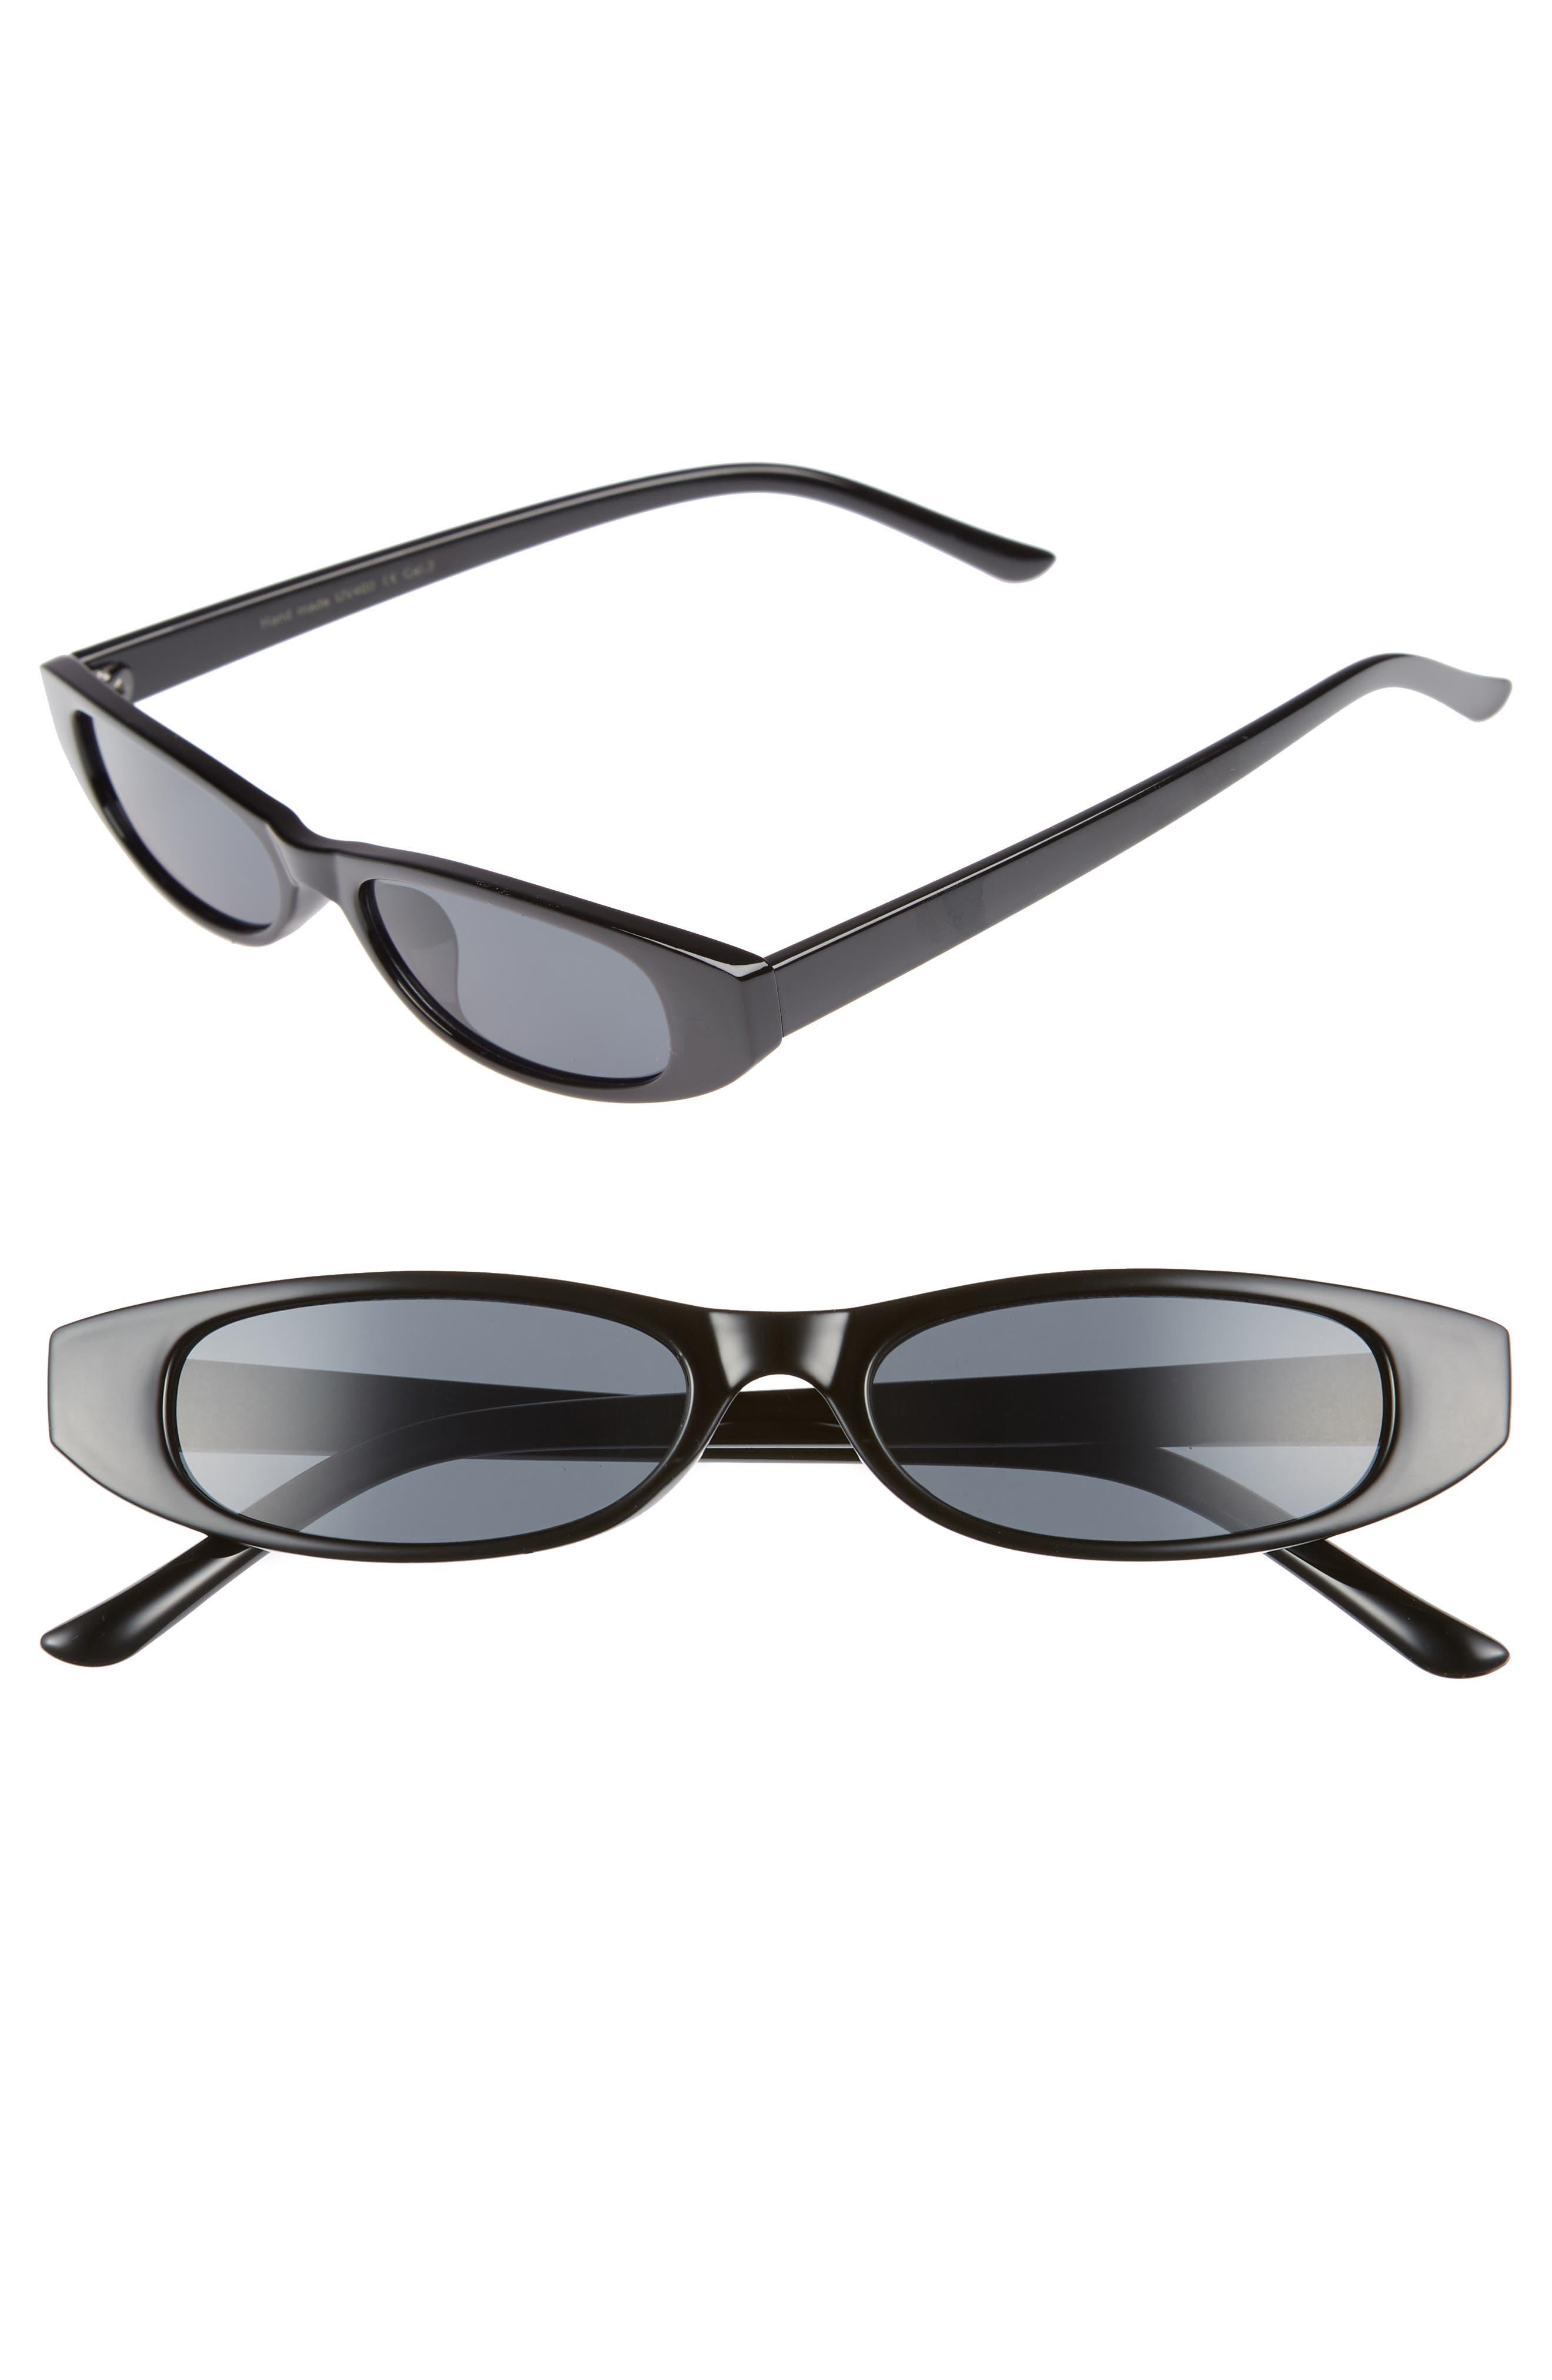 50mm Geometric Sunglasses,                         Main,                         color, Black